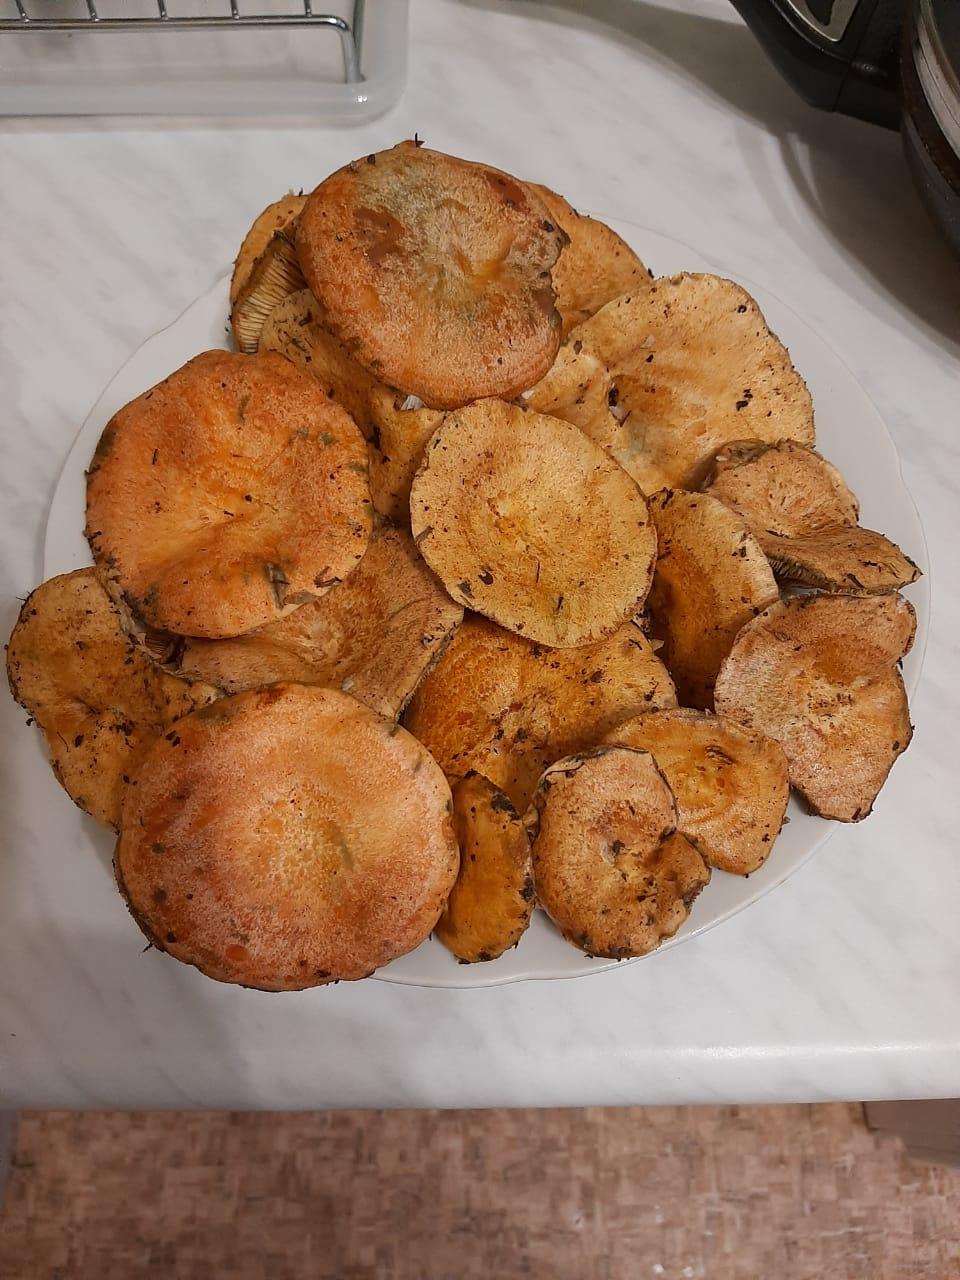 не знаю что за грибы